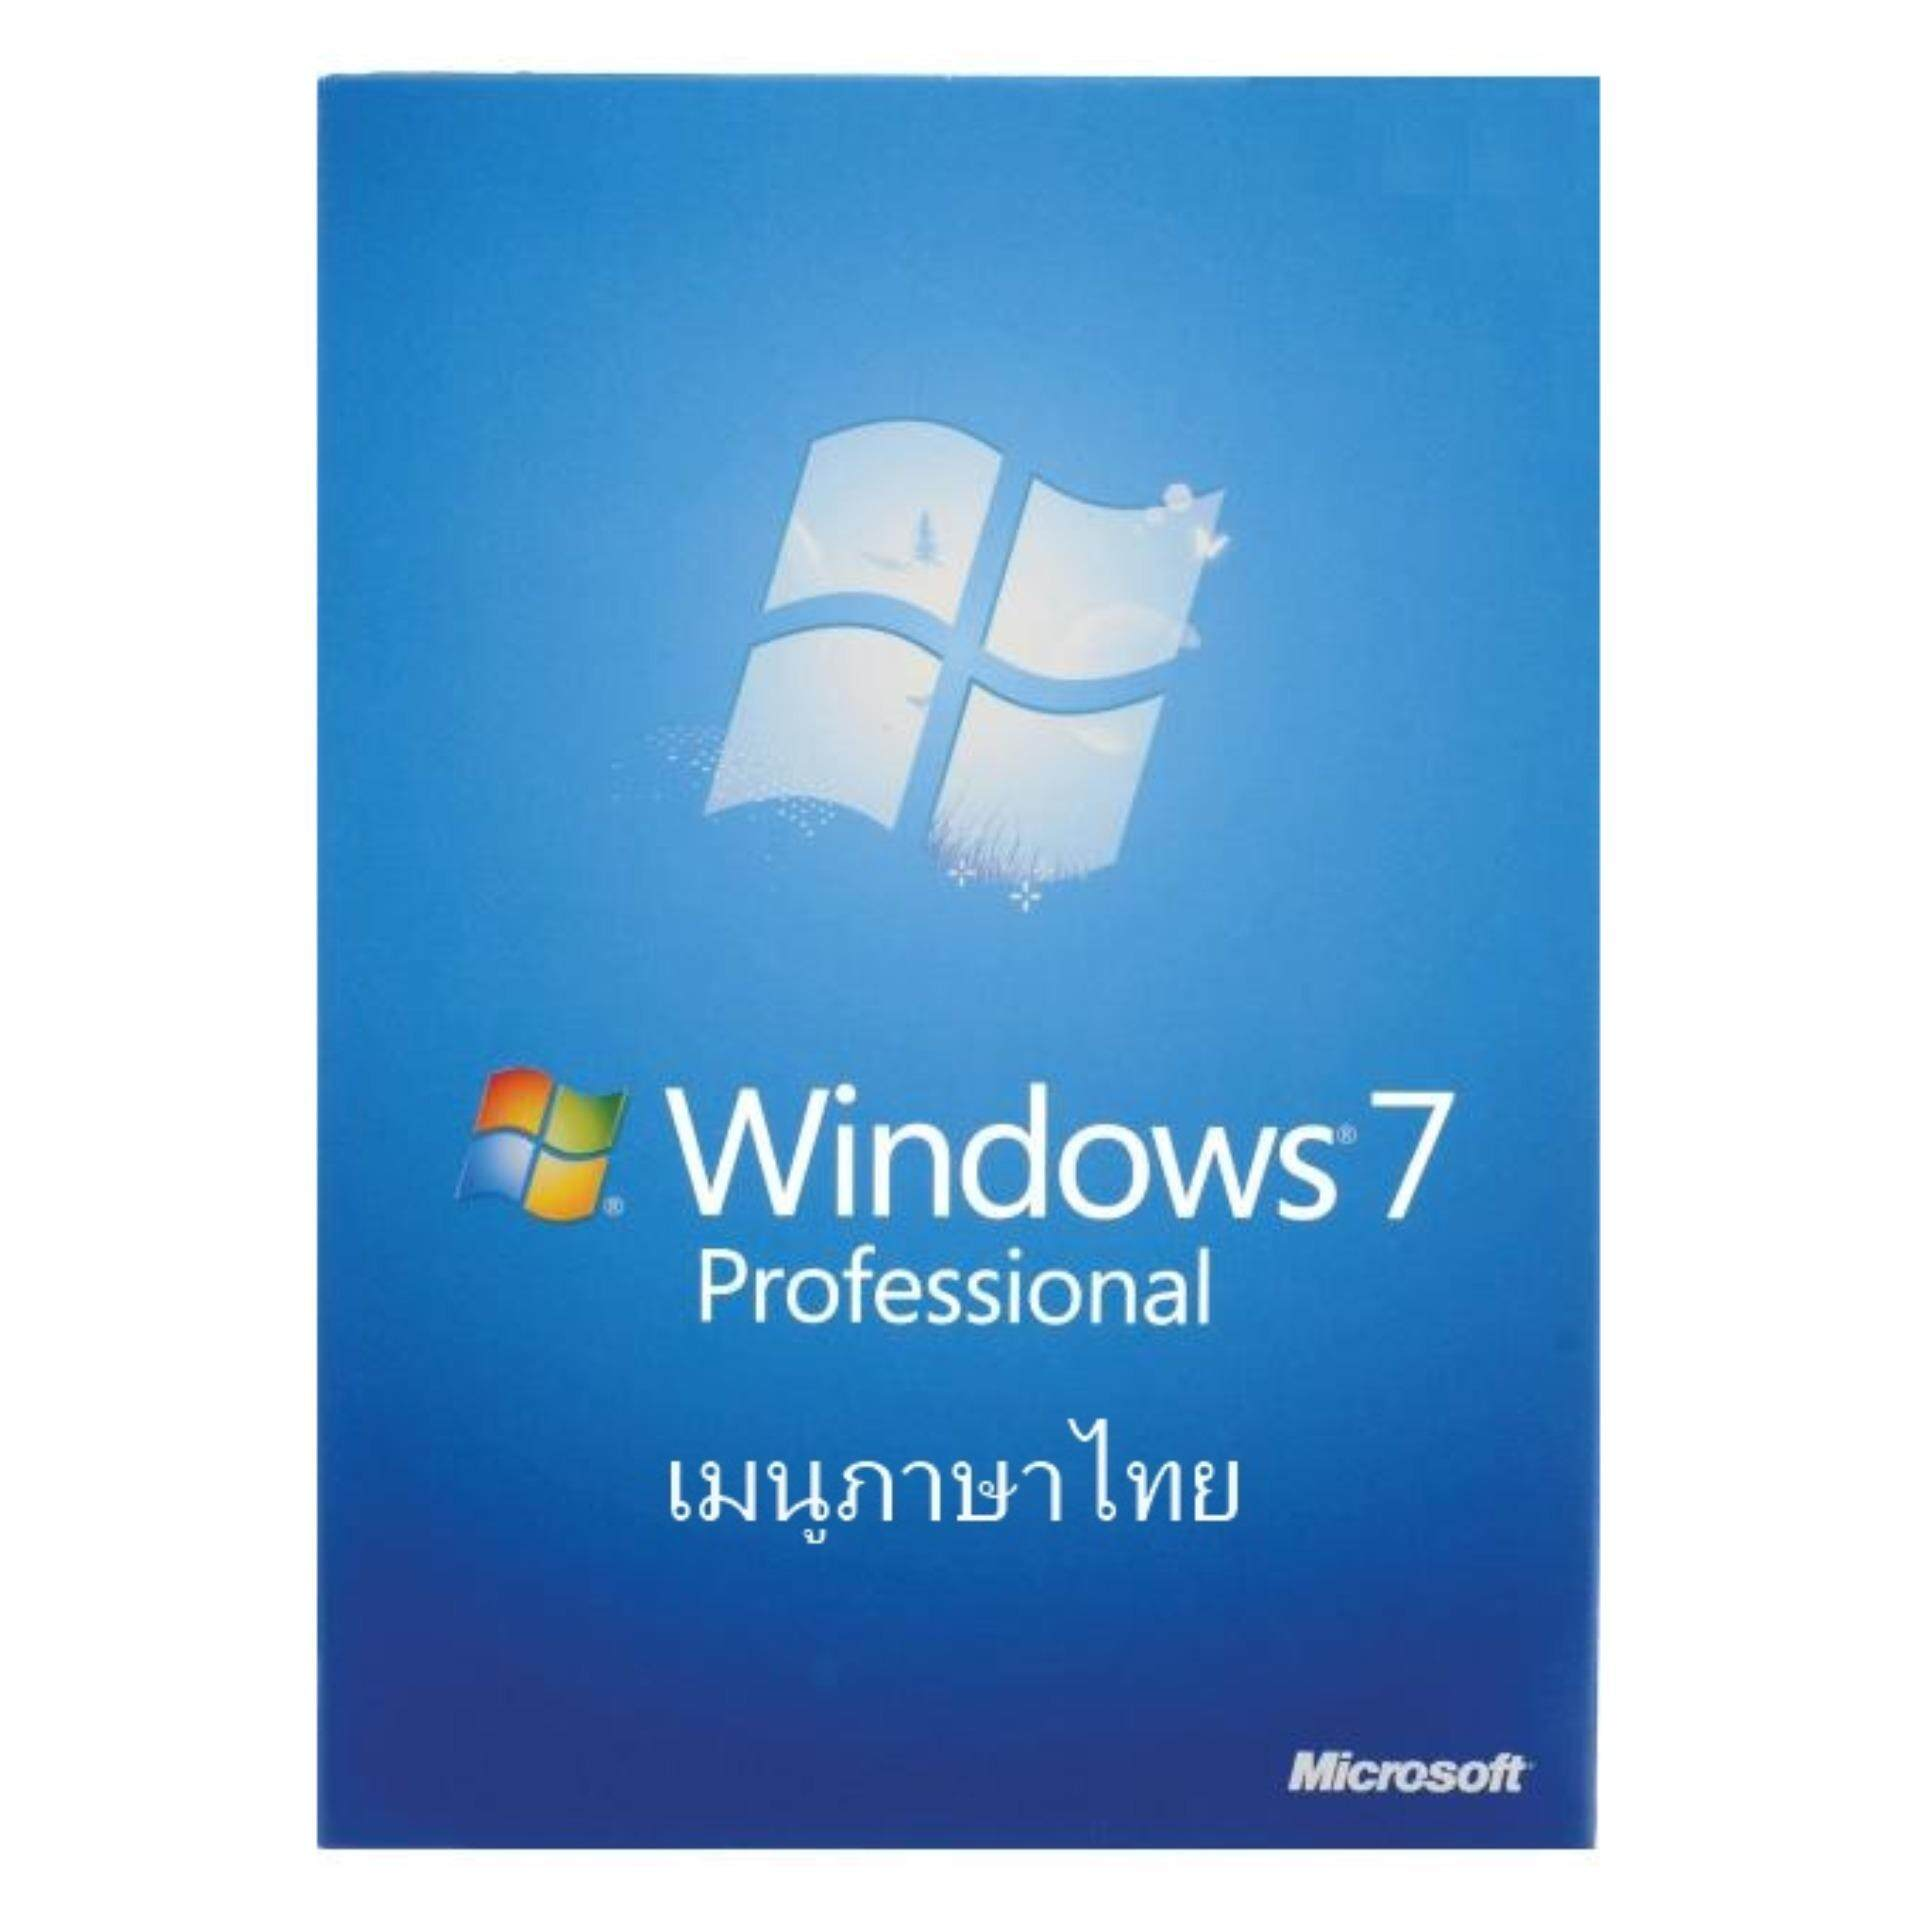 Windows 7 32bit เมนูภาษาไทยทั้งหมด + Activate By Tlkshop.